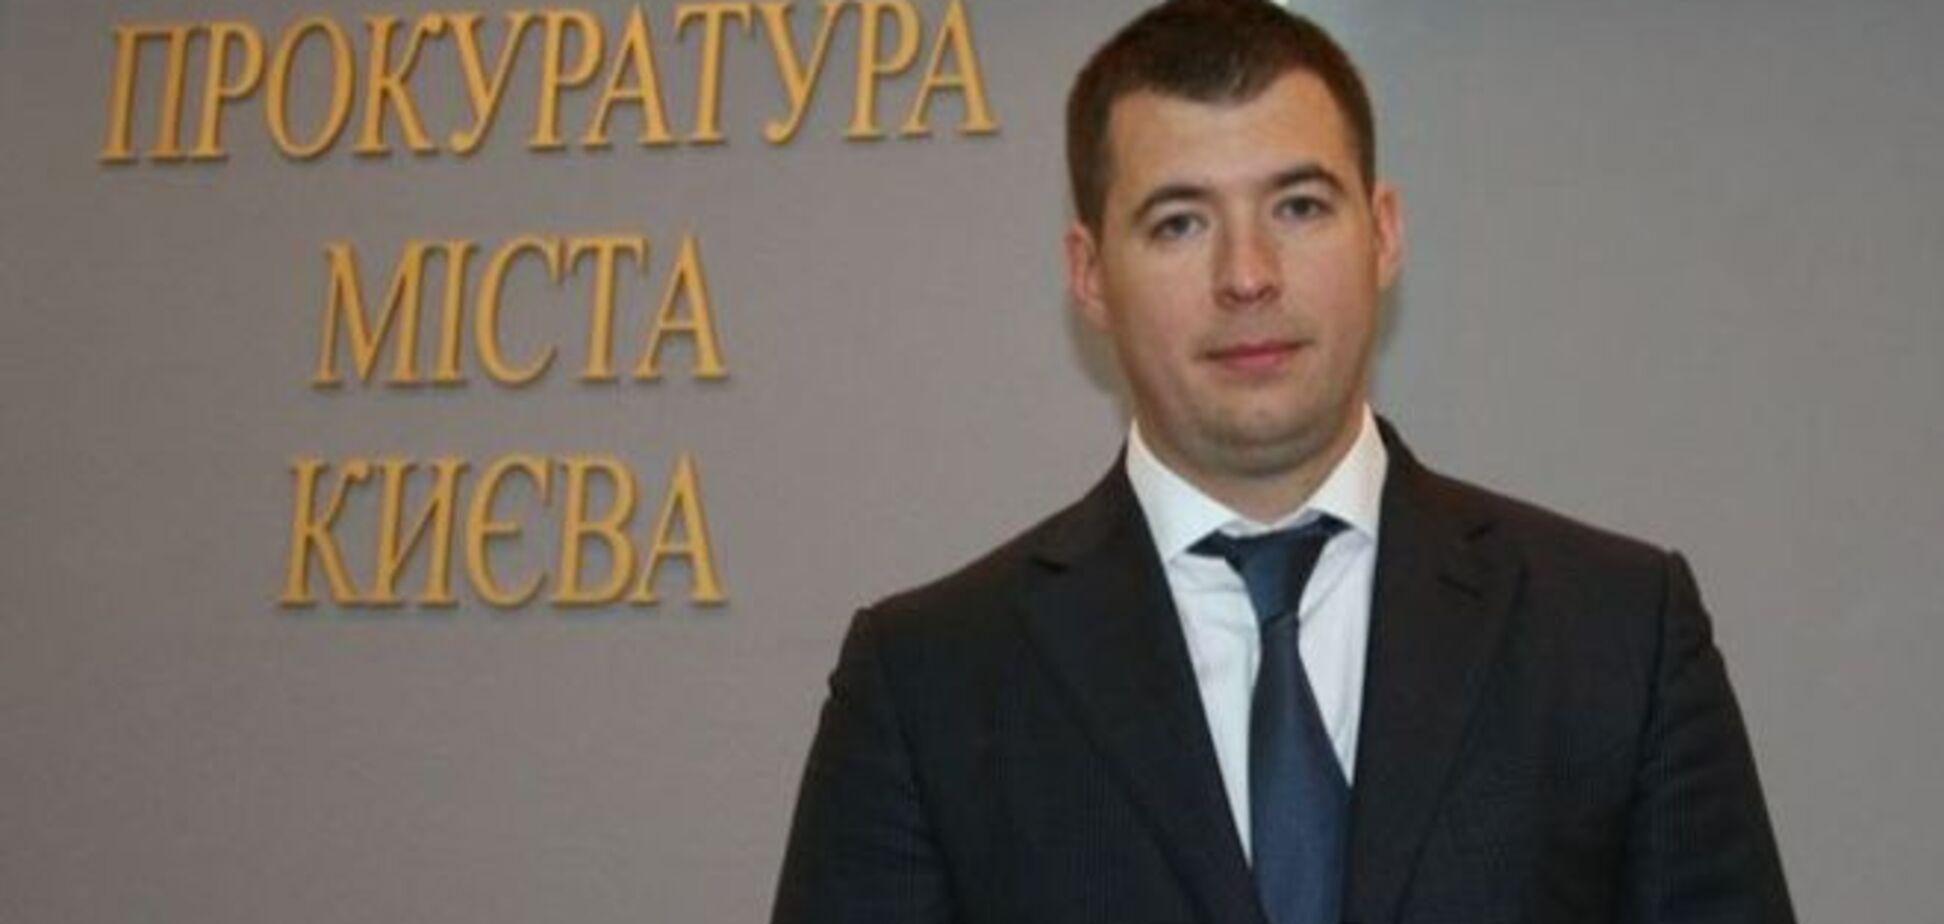 На прокурора Киева Юлдашева завели дело: документ